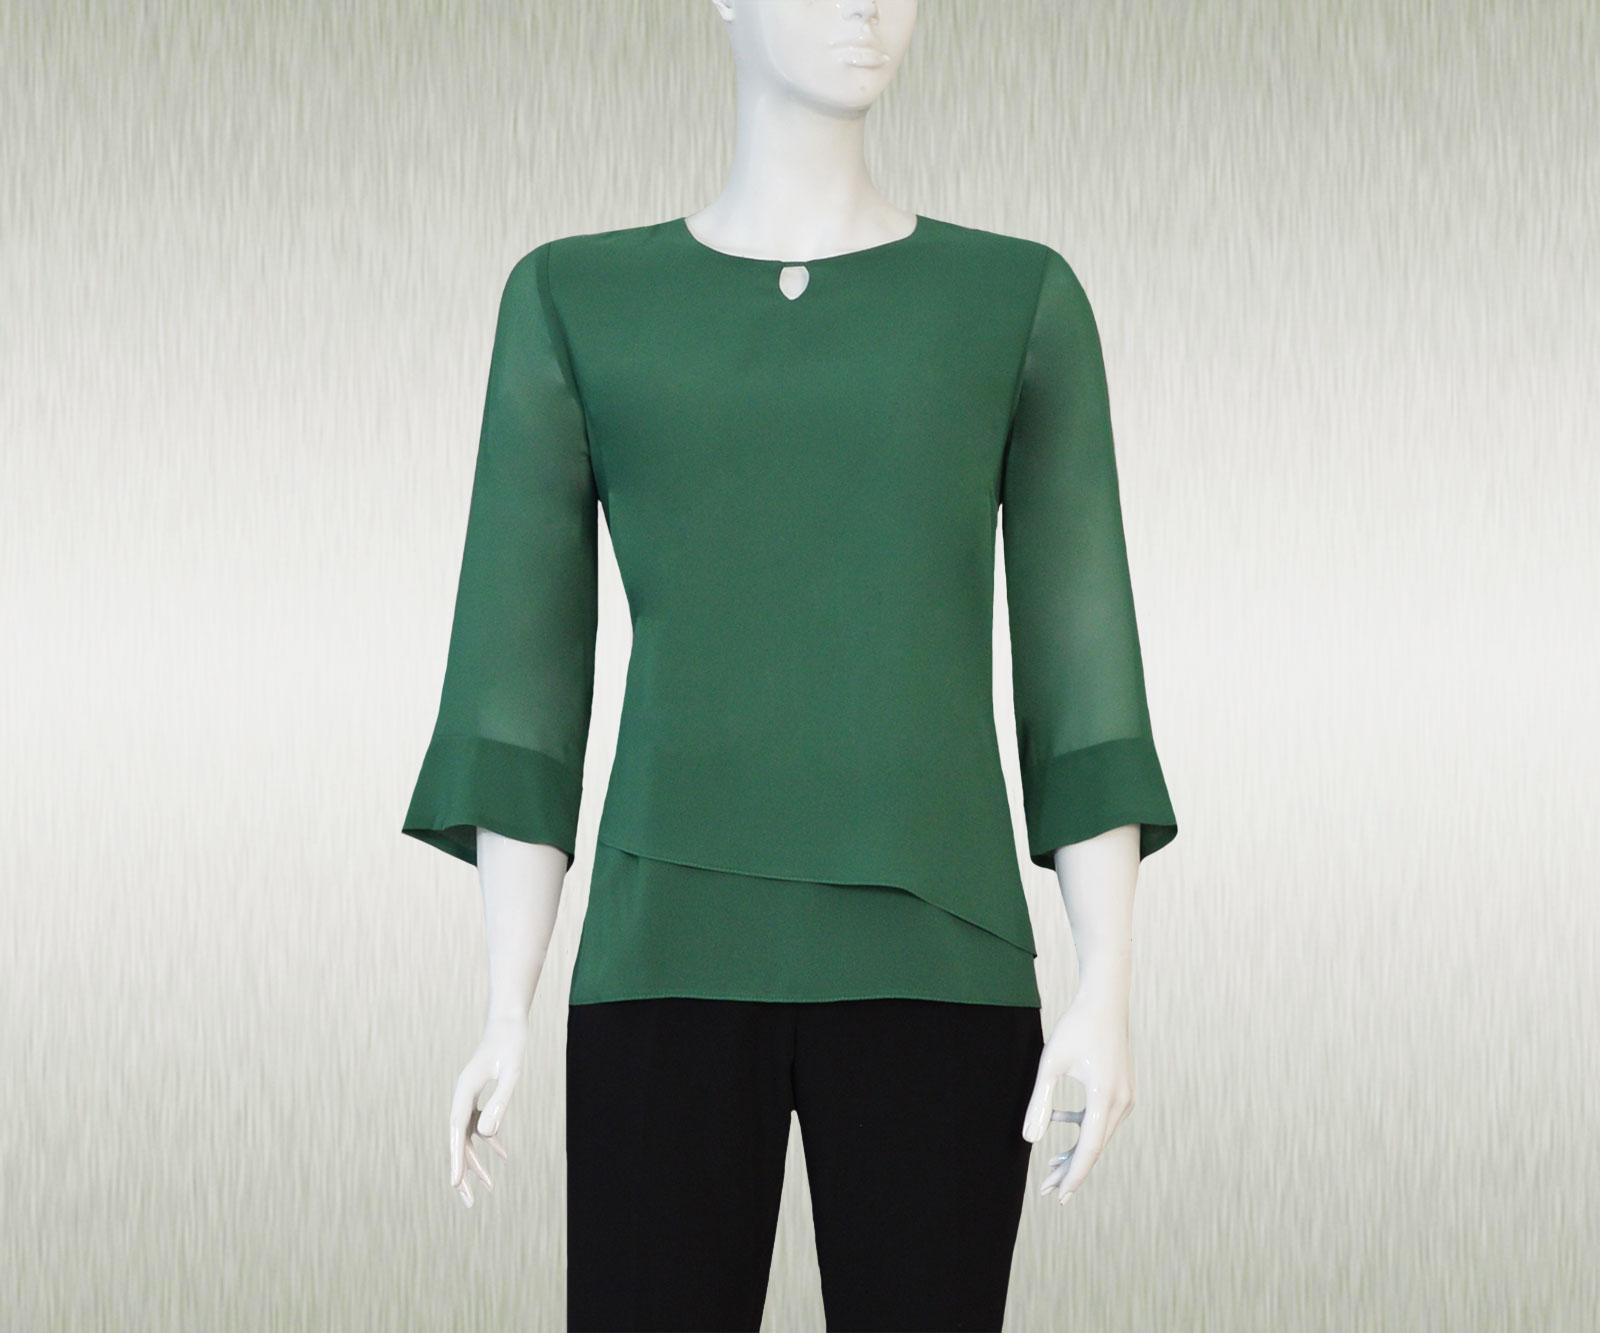 Ženska bluza TAMARA Srnec Style